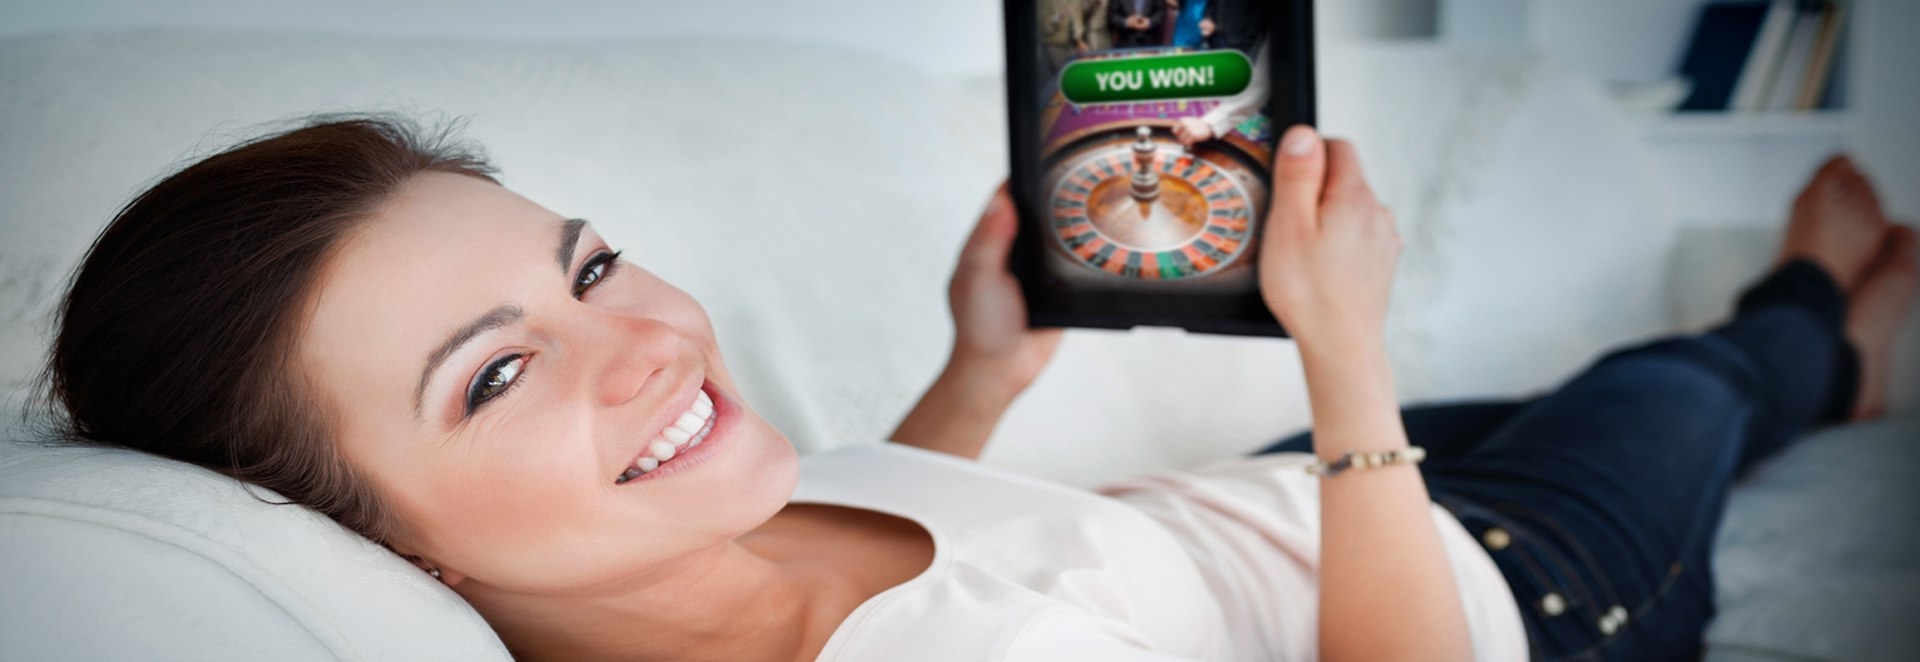 5 популярных азартных игр